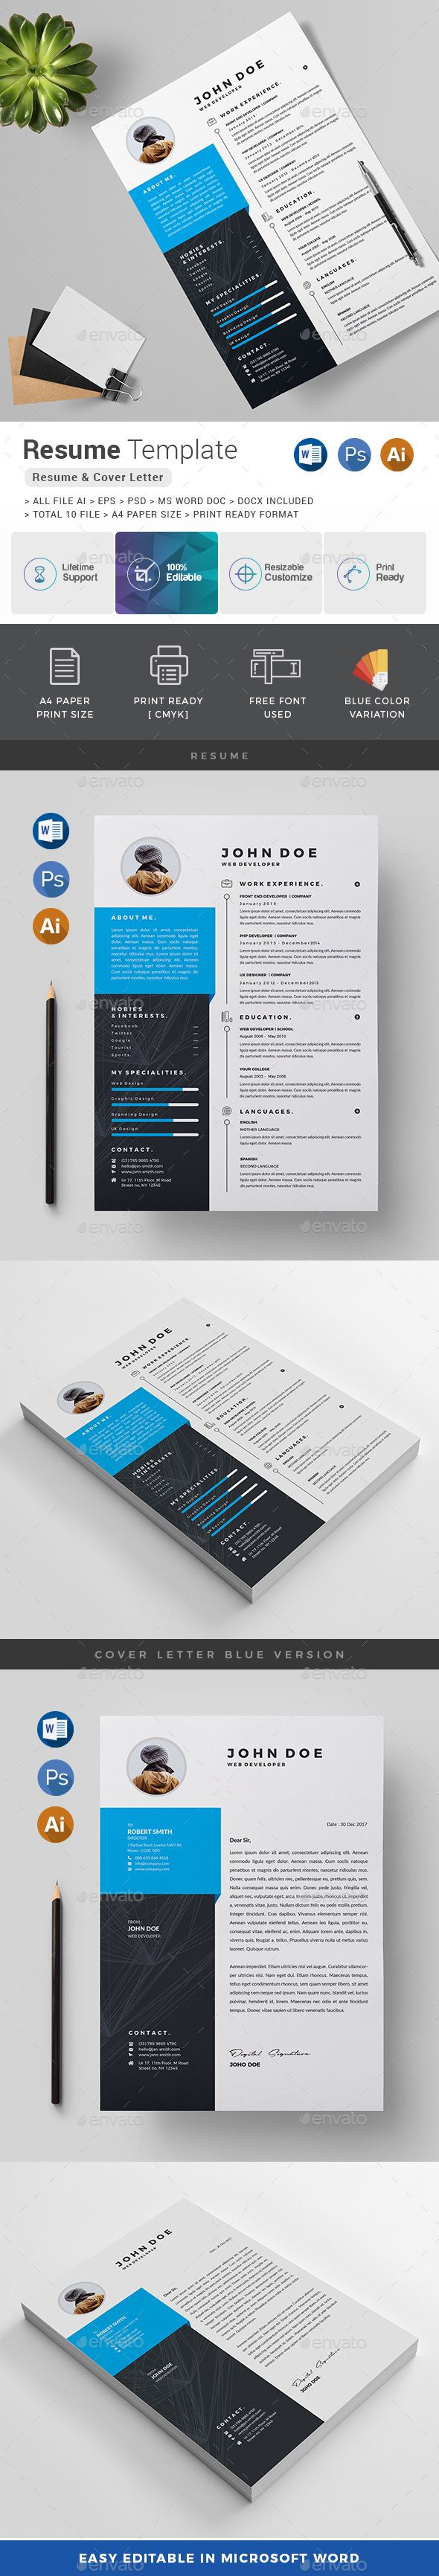 Pin By Fdesign Nerd On Resume 2018 Resume Design Template Best